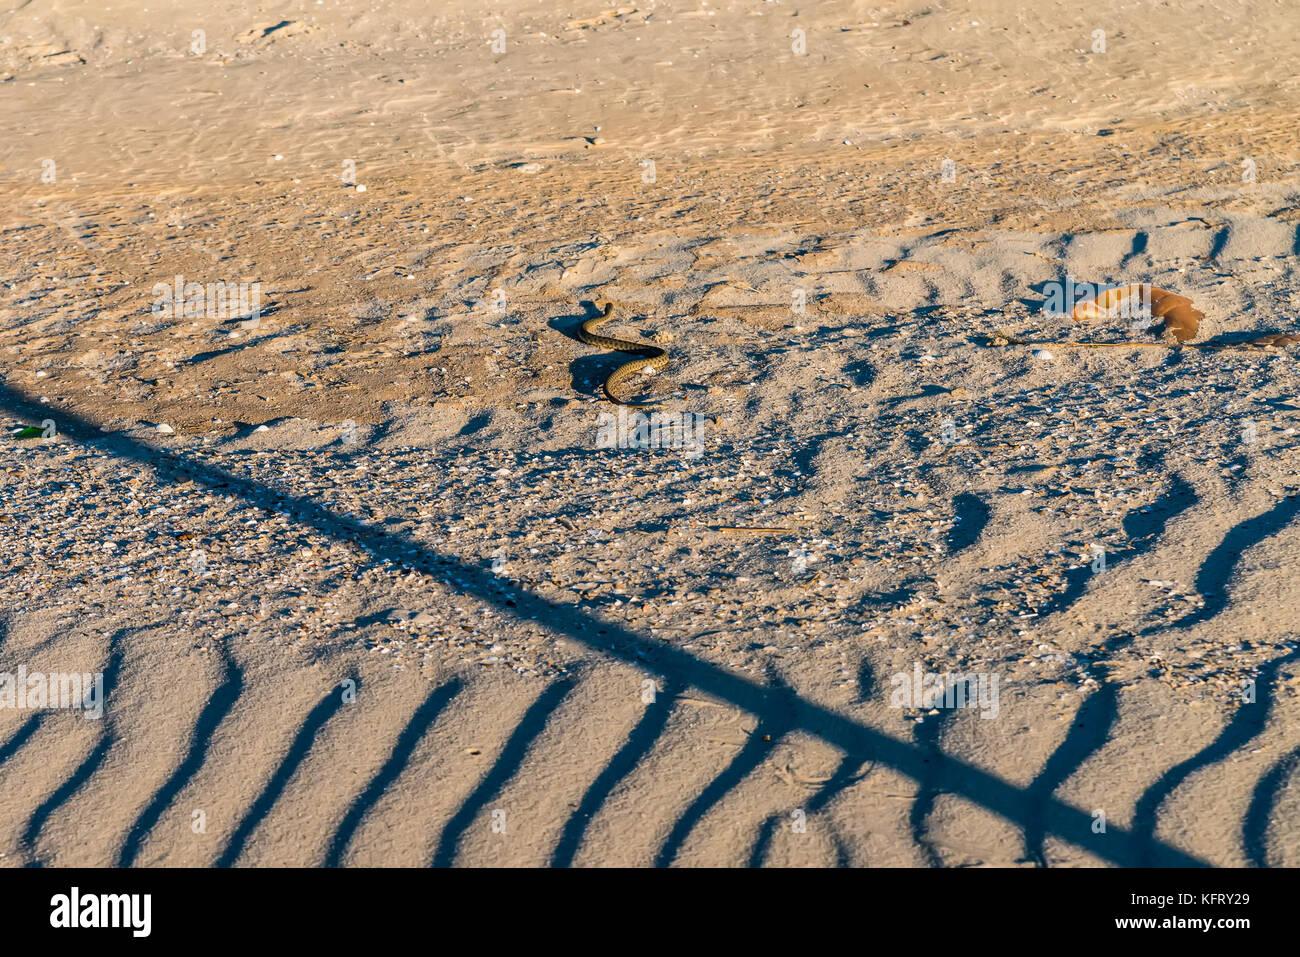 Dice snake or Natrix tessellata on sand - Stock Image